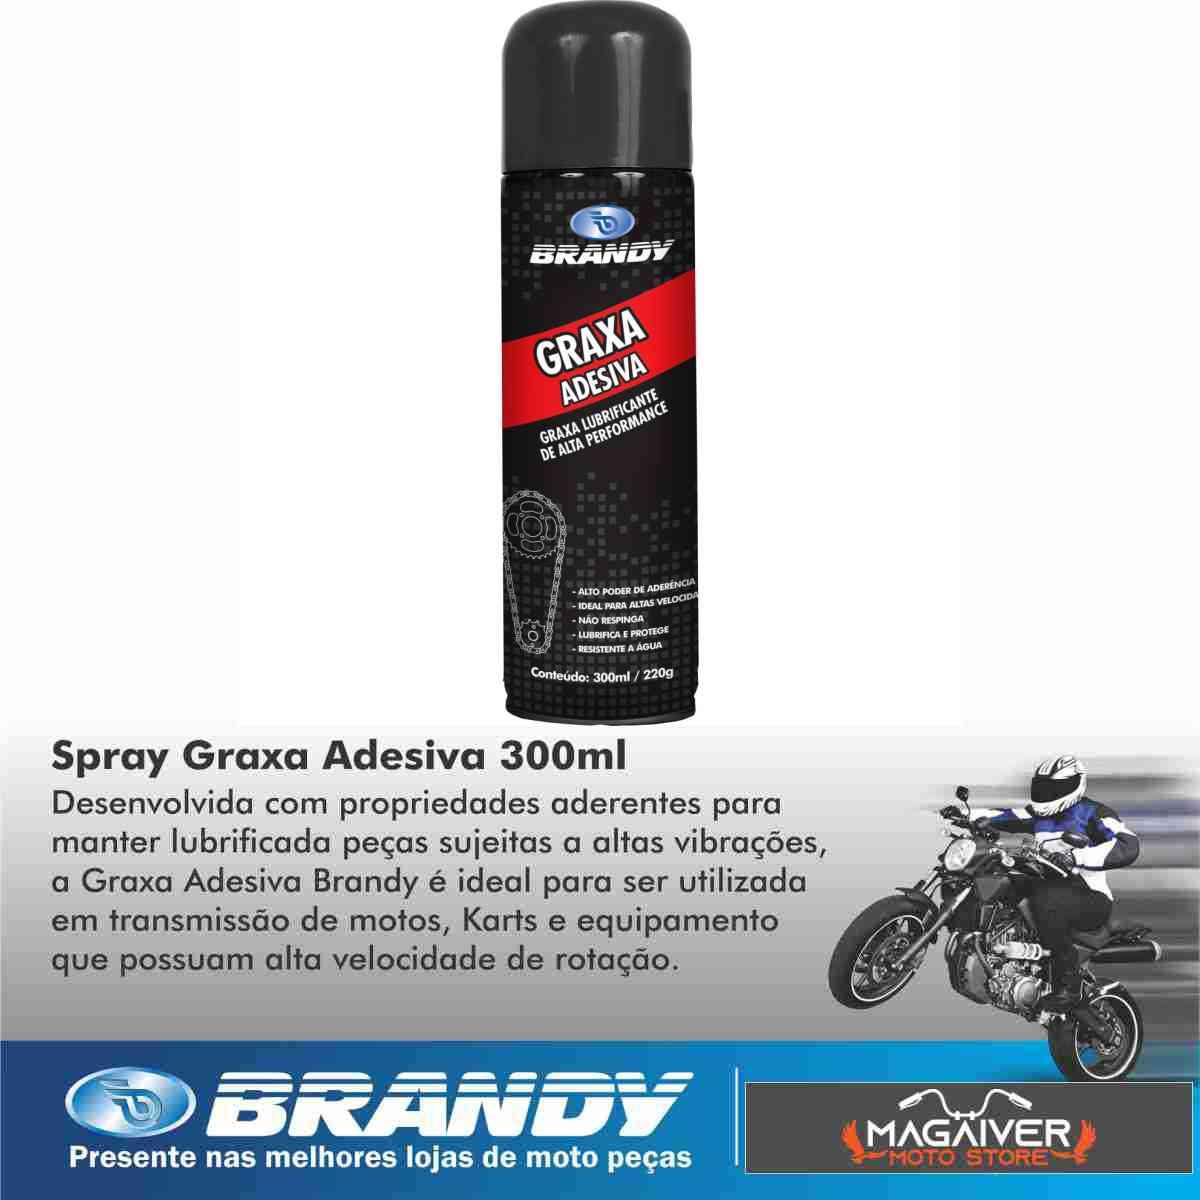 KIT 1 GRAXA ADESIVA MOTO SPRAY BRANDY ALTA PERFORMANCE + 2 REMOVEDOR LIMPA CORRENTE E MOTOR 300ml